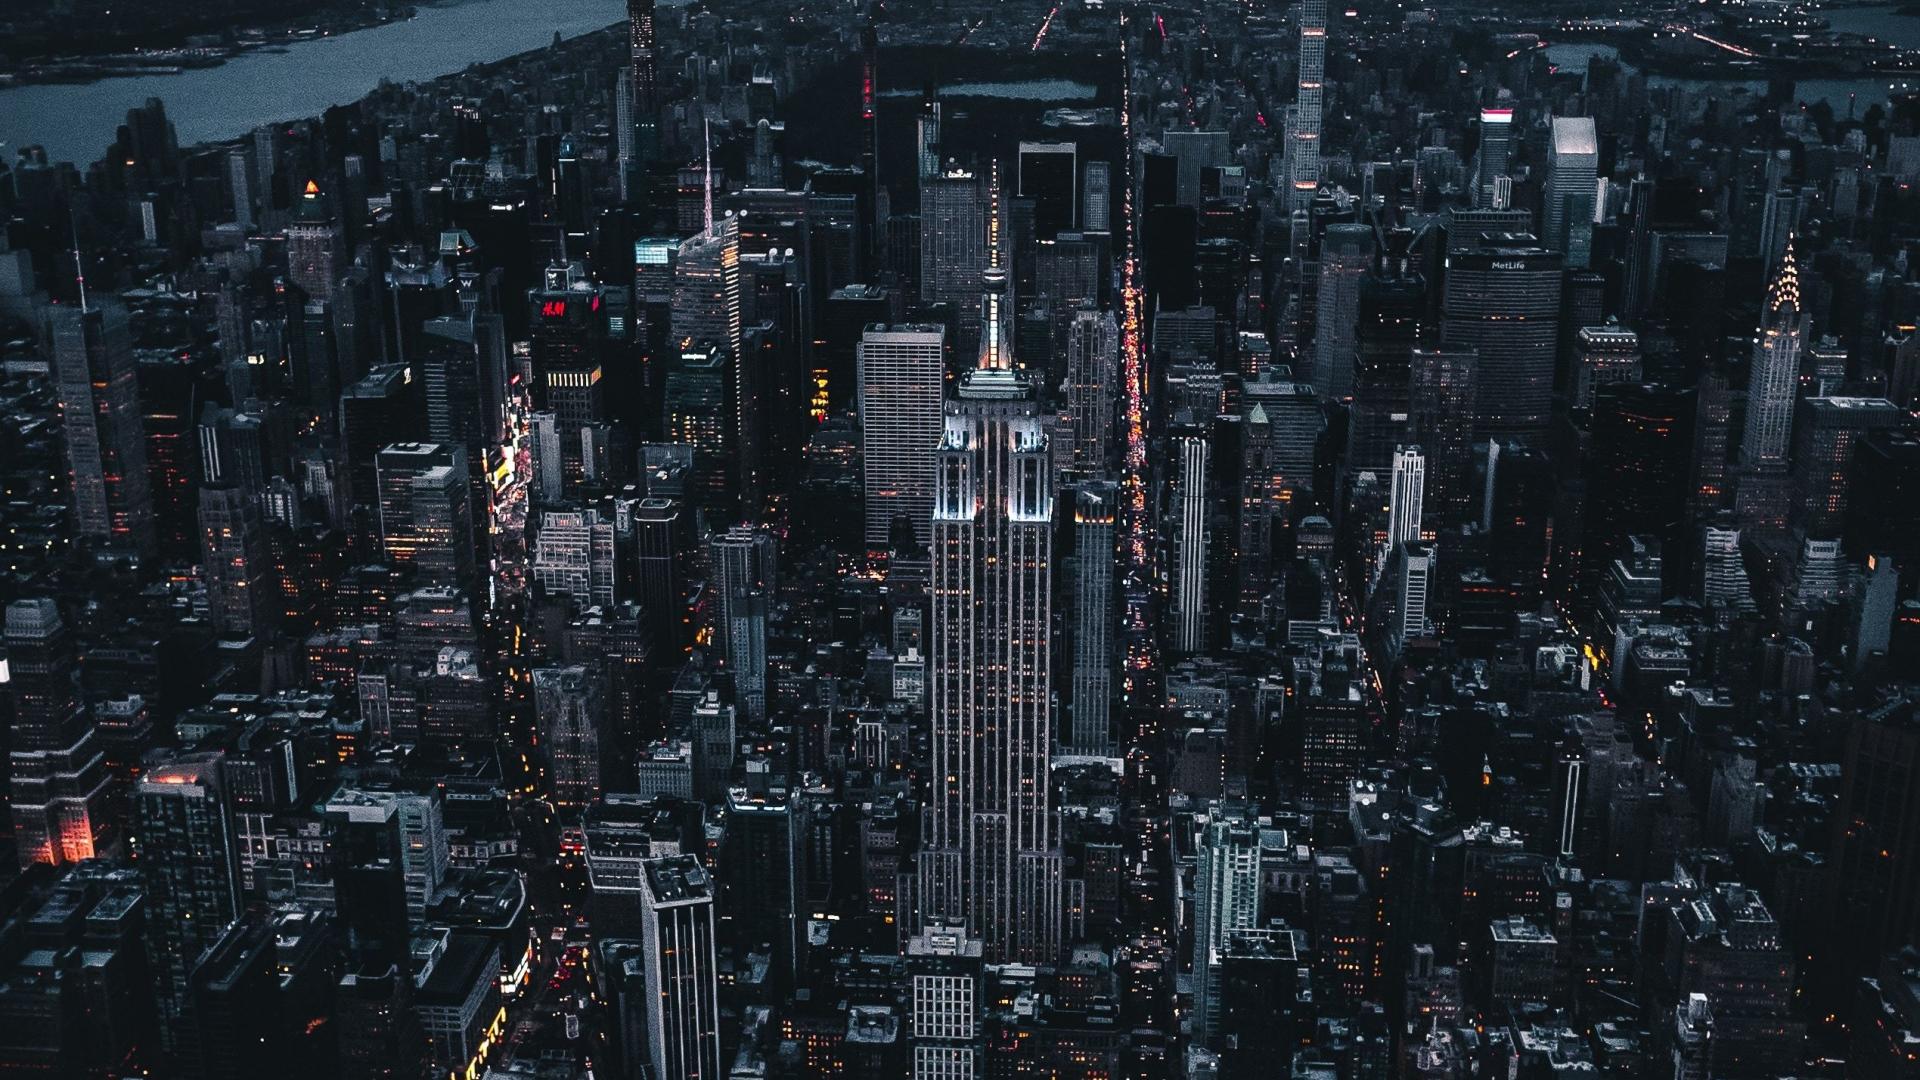 Download 1920x1080 Wallpaper New York Dark Night City Aerial View Full Hd Hdtv Fhd 1080p 1920x1080 Hd Image Background 16532